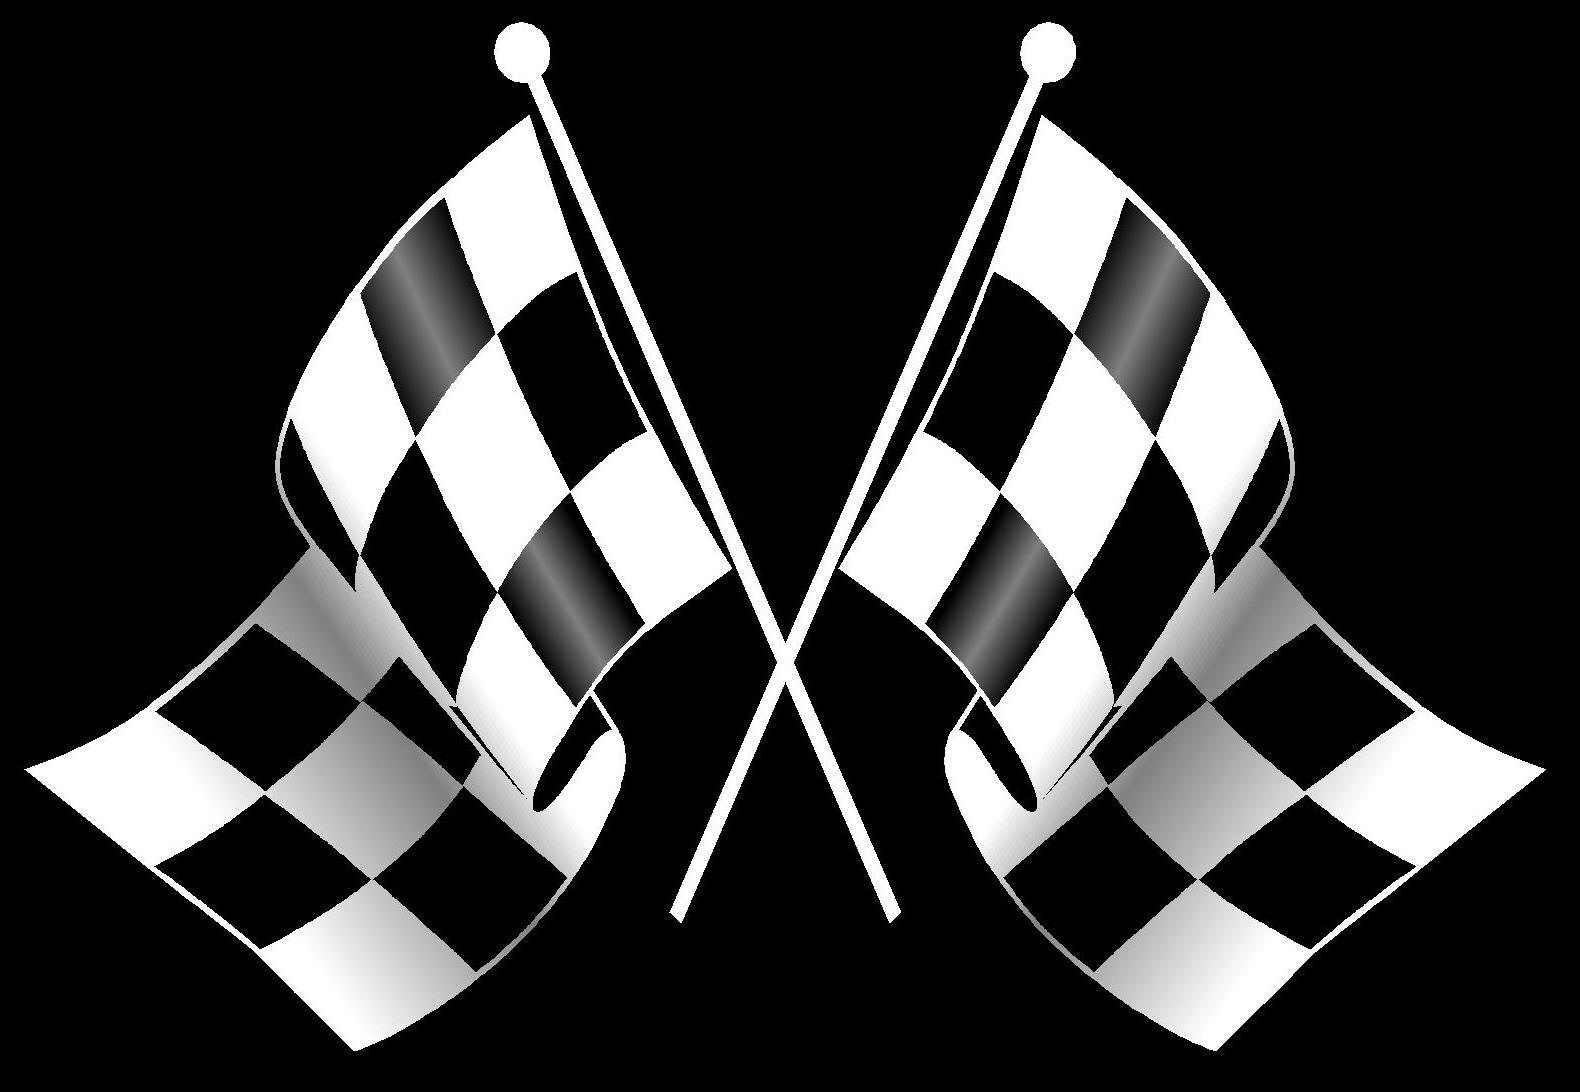 checkered-flag